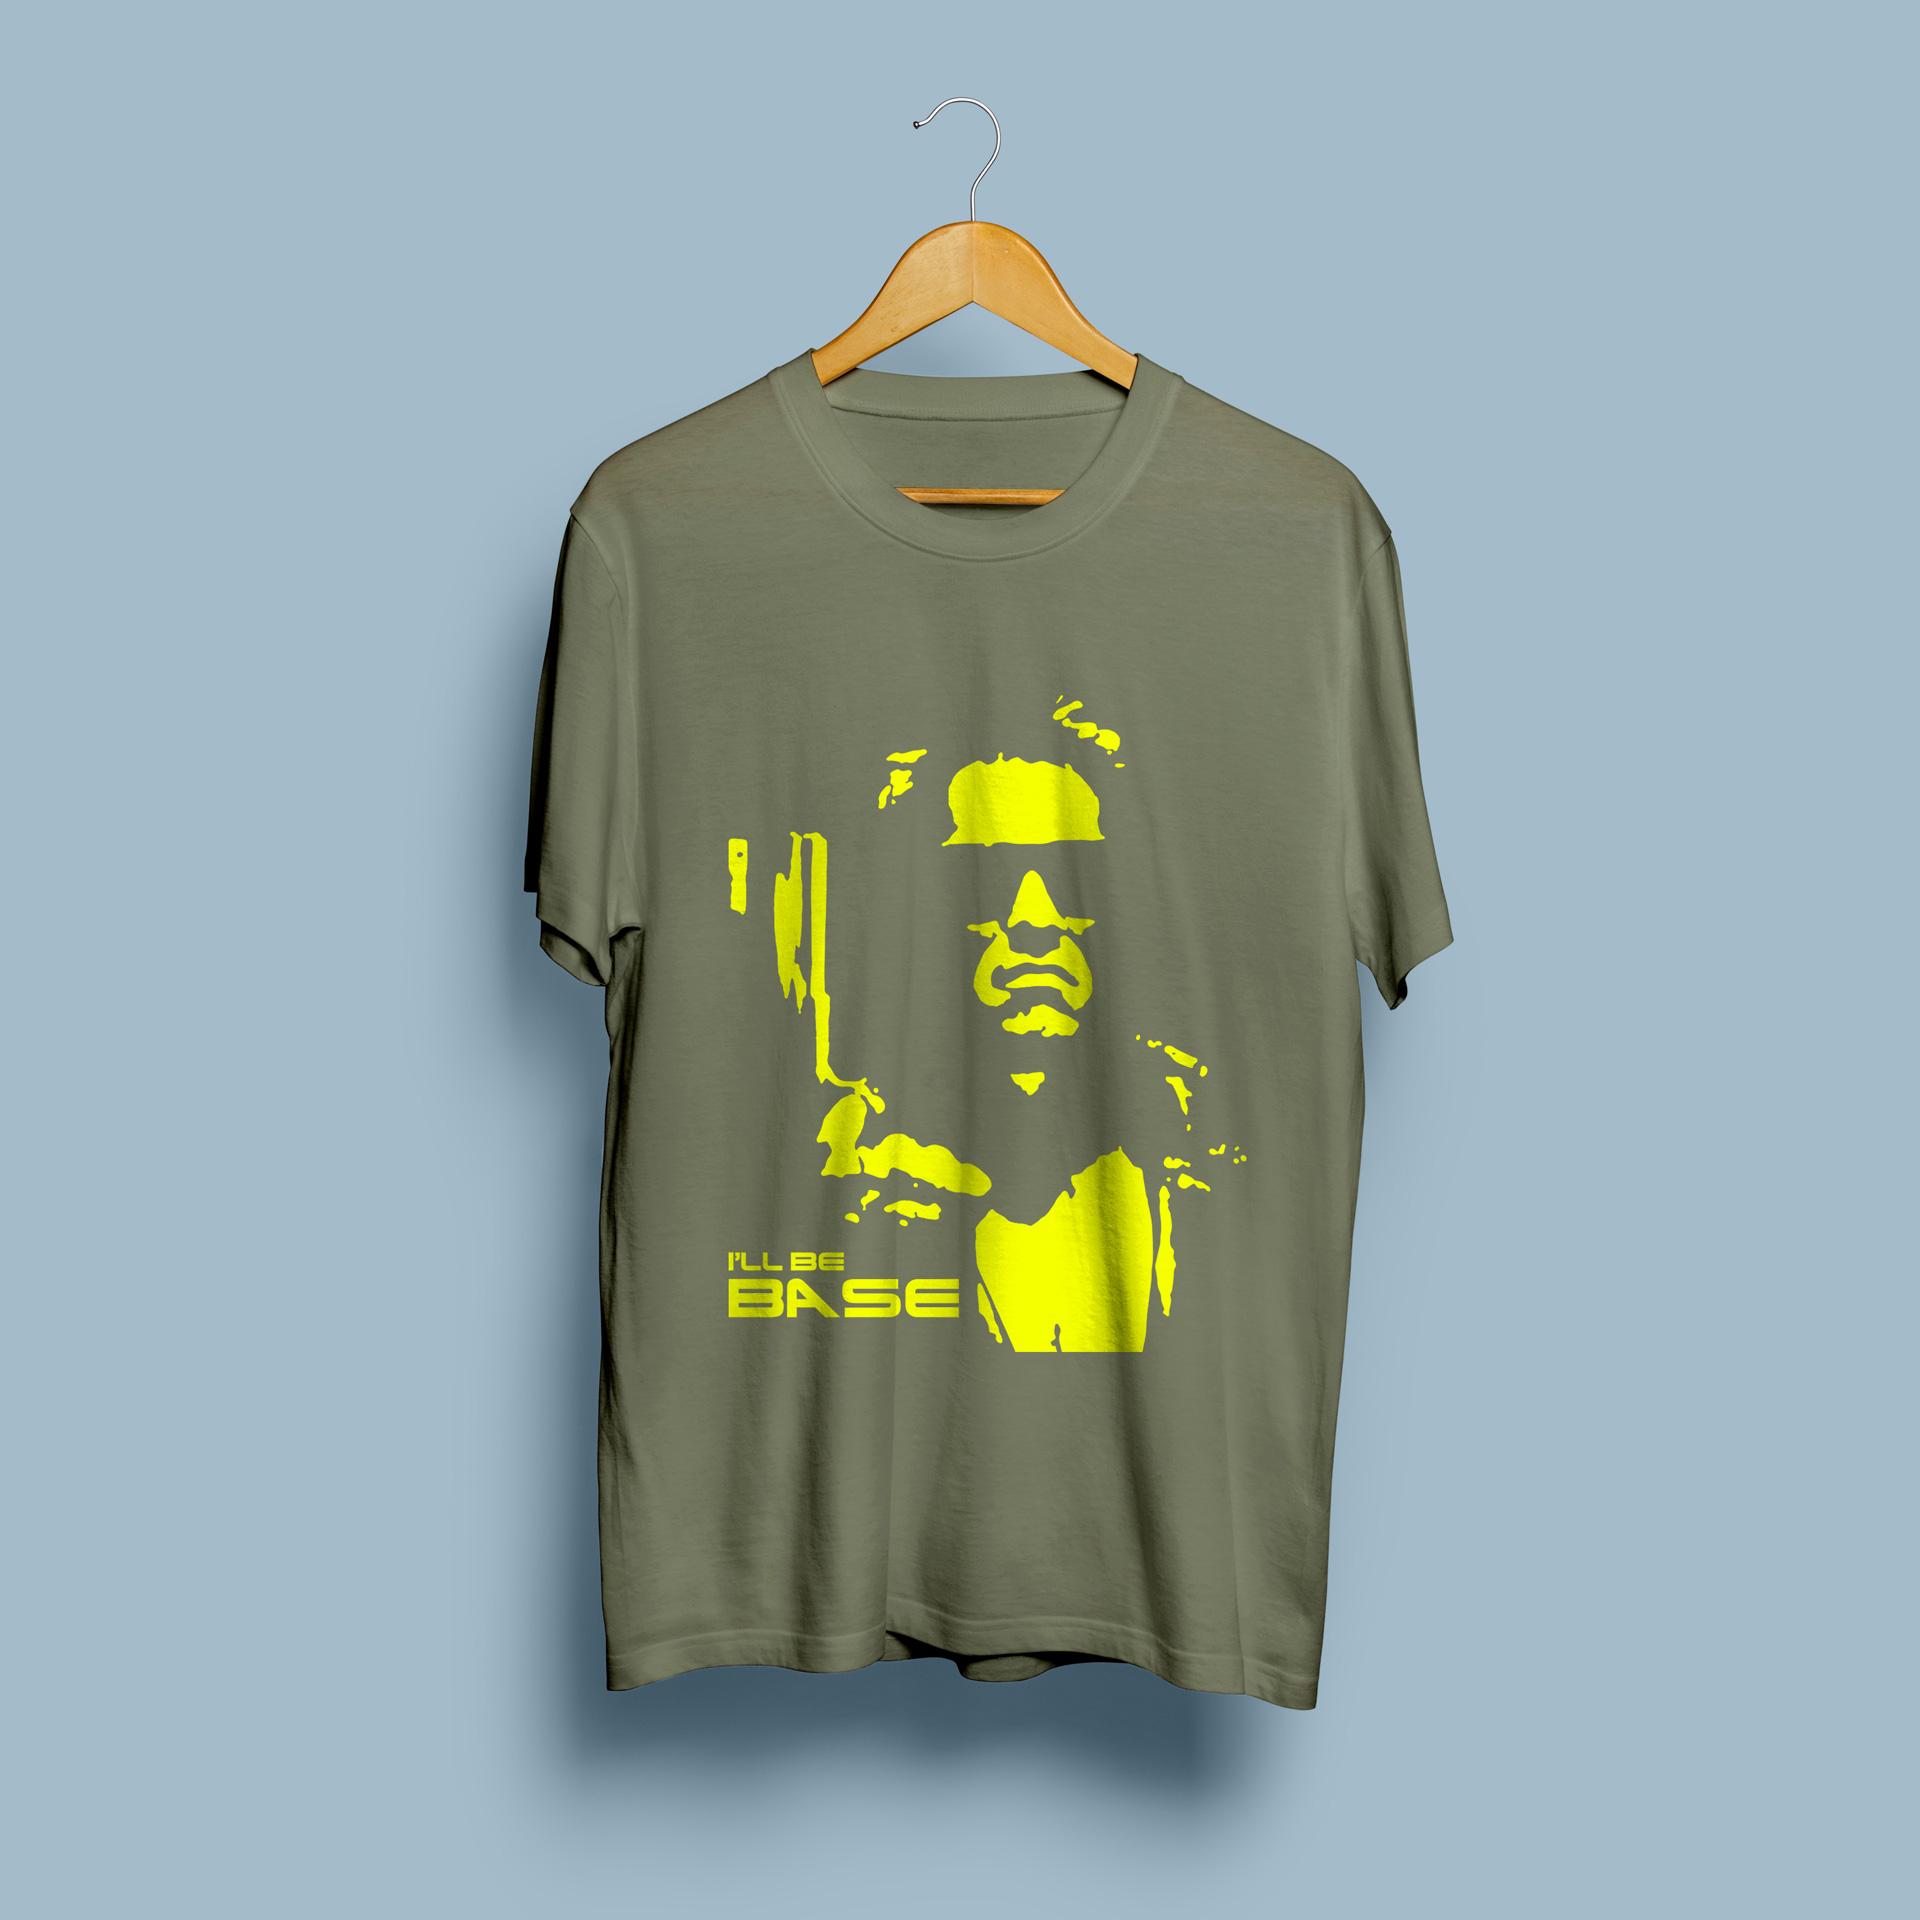 I'LL BE BASE T-Shirt